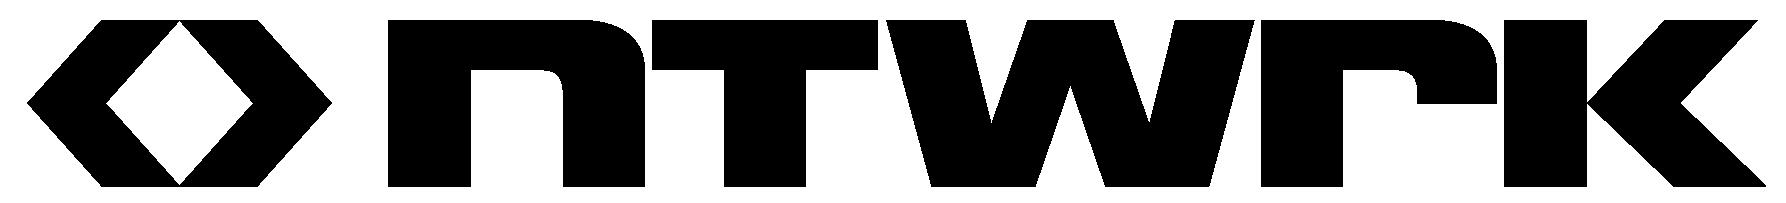 The NTWRK